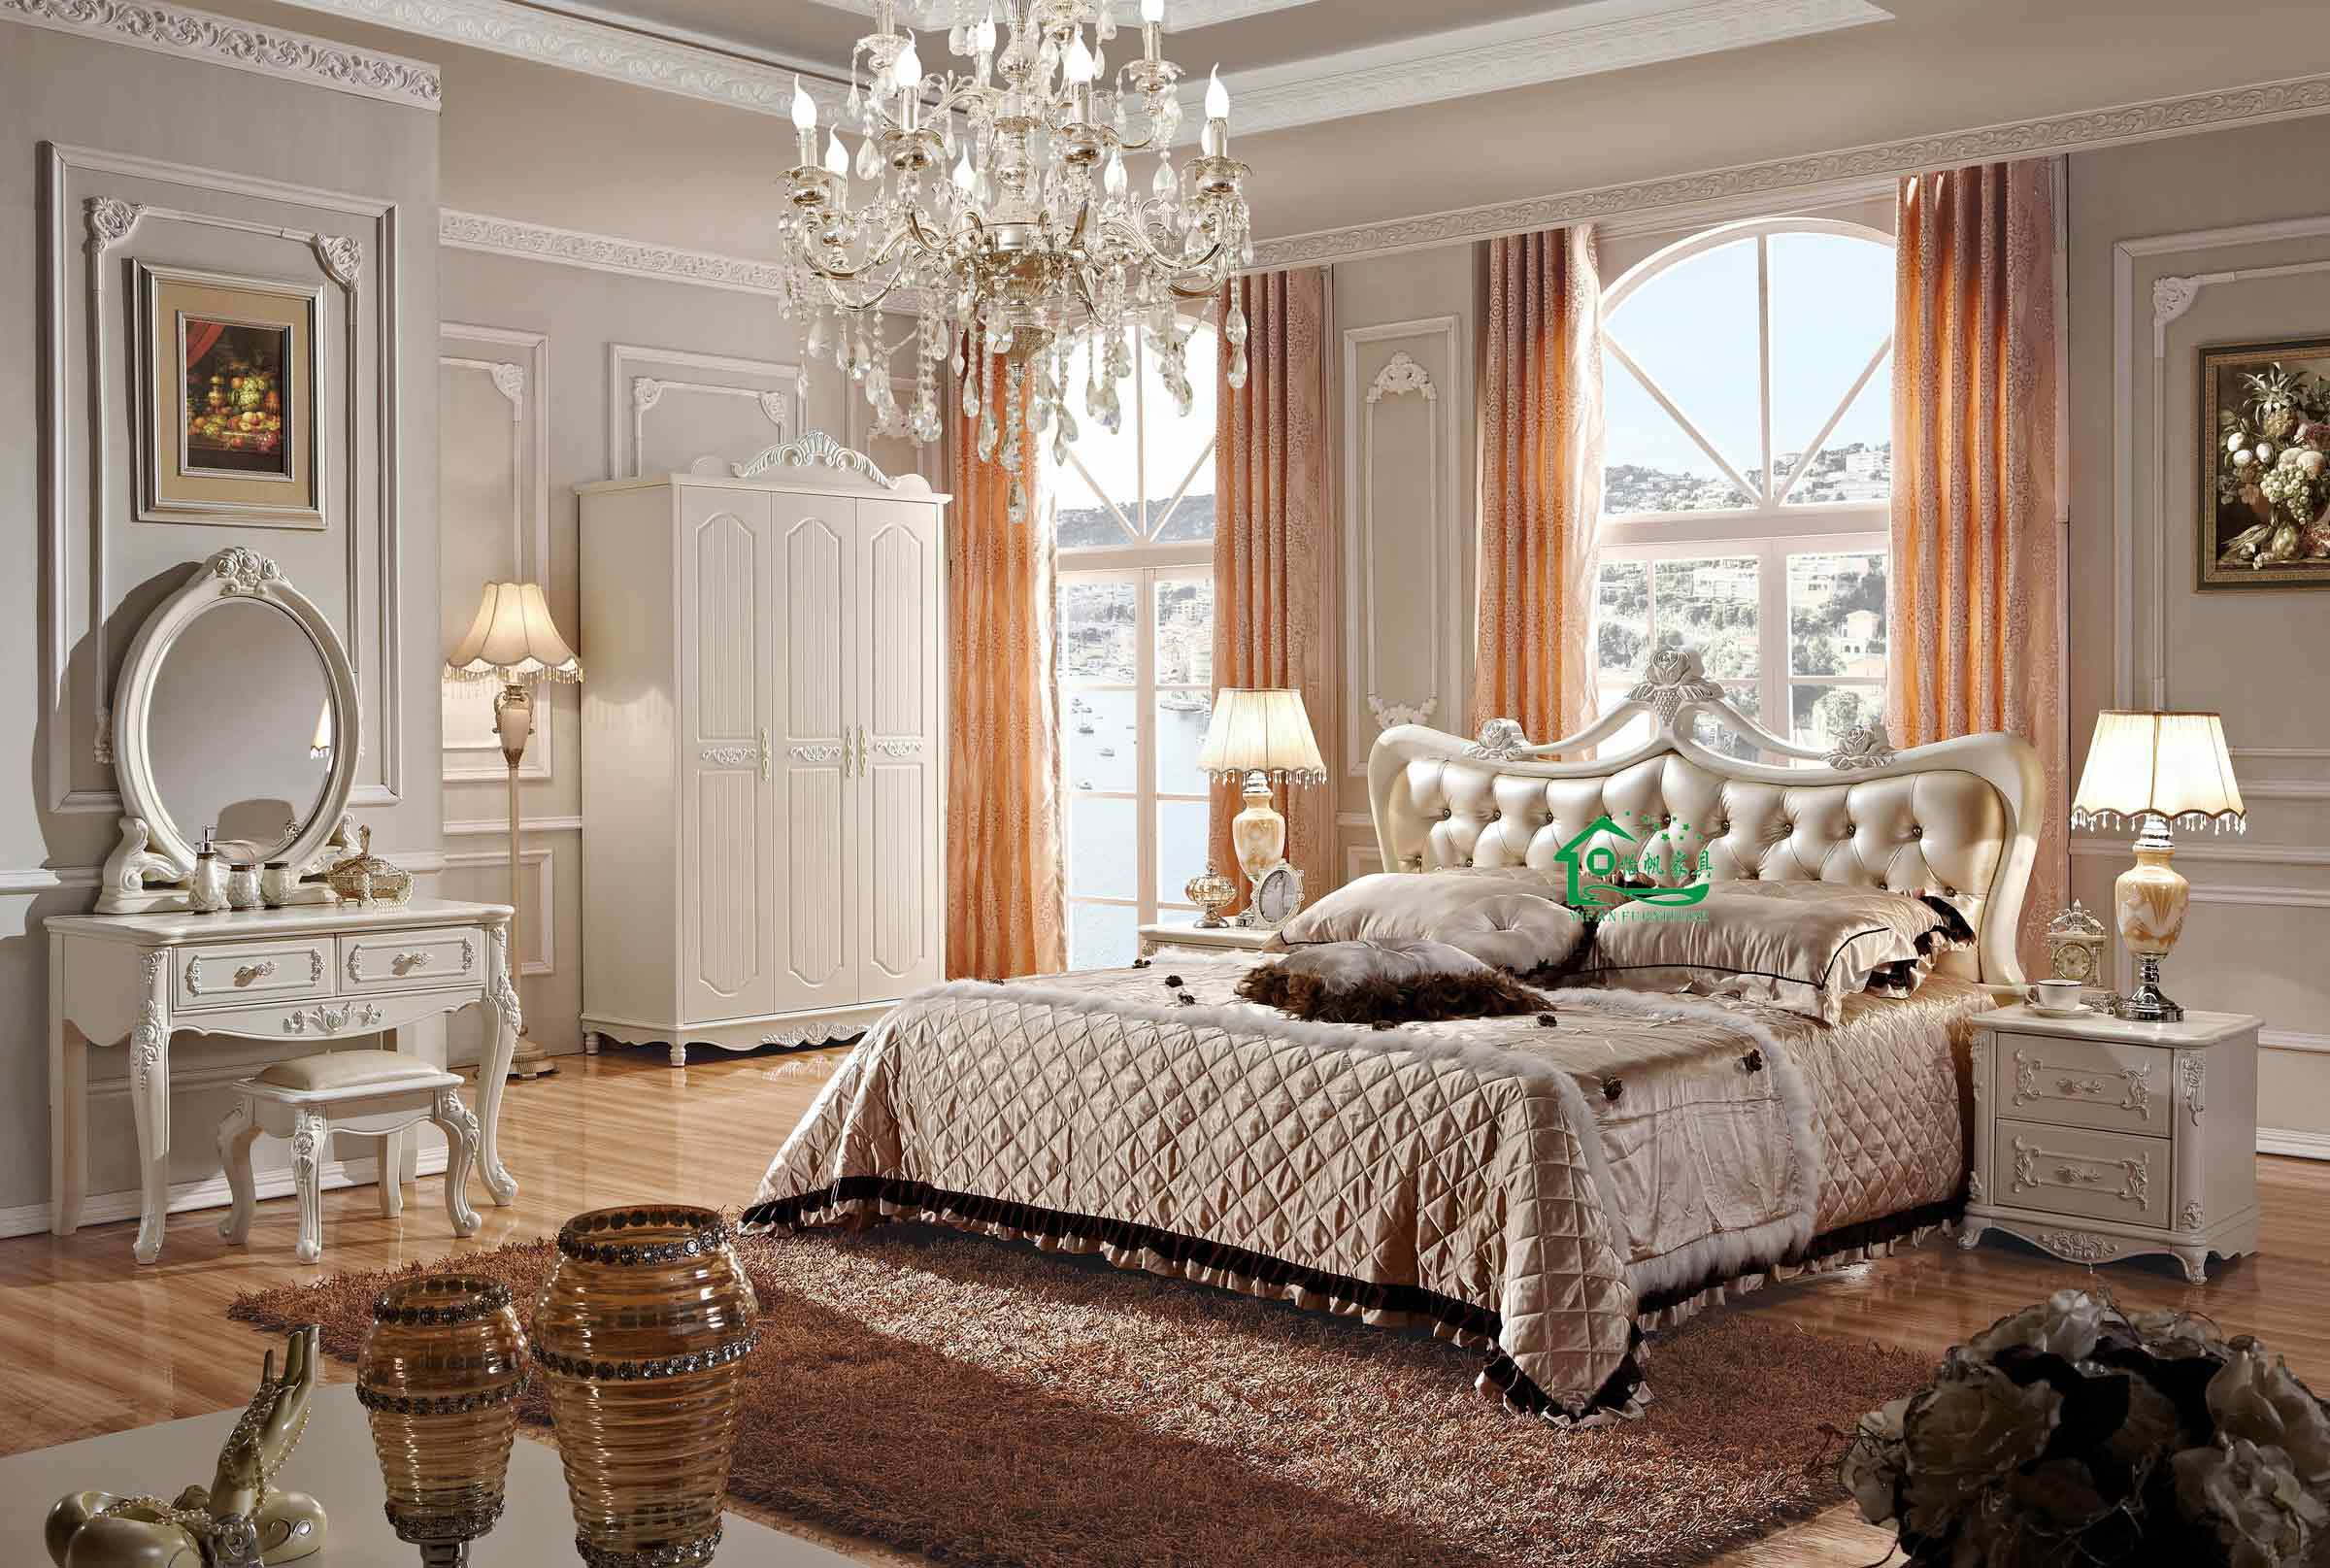 Uncategorized. Cheap Furniture Kitchener. jamesmcavoybr Home Design